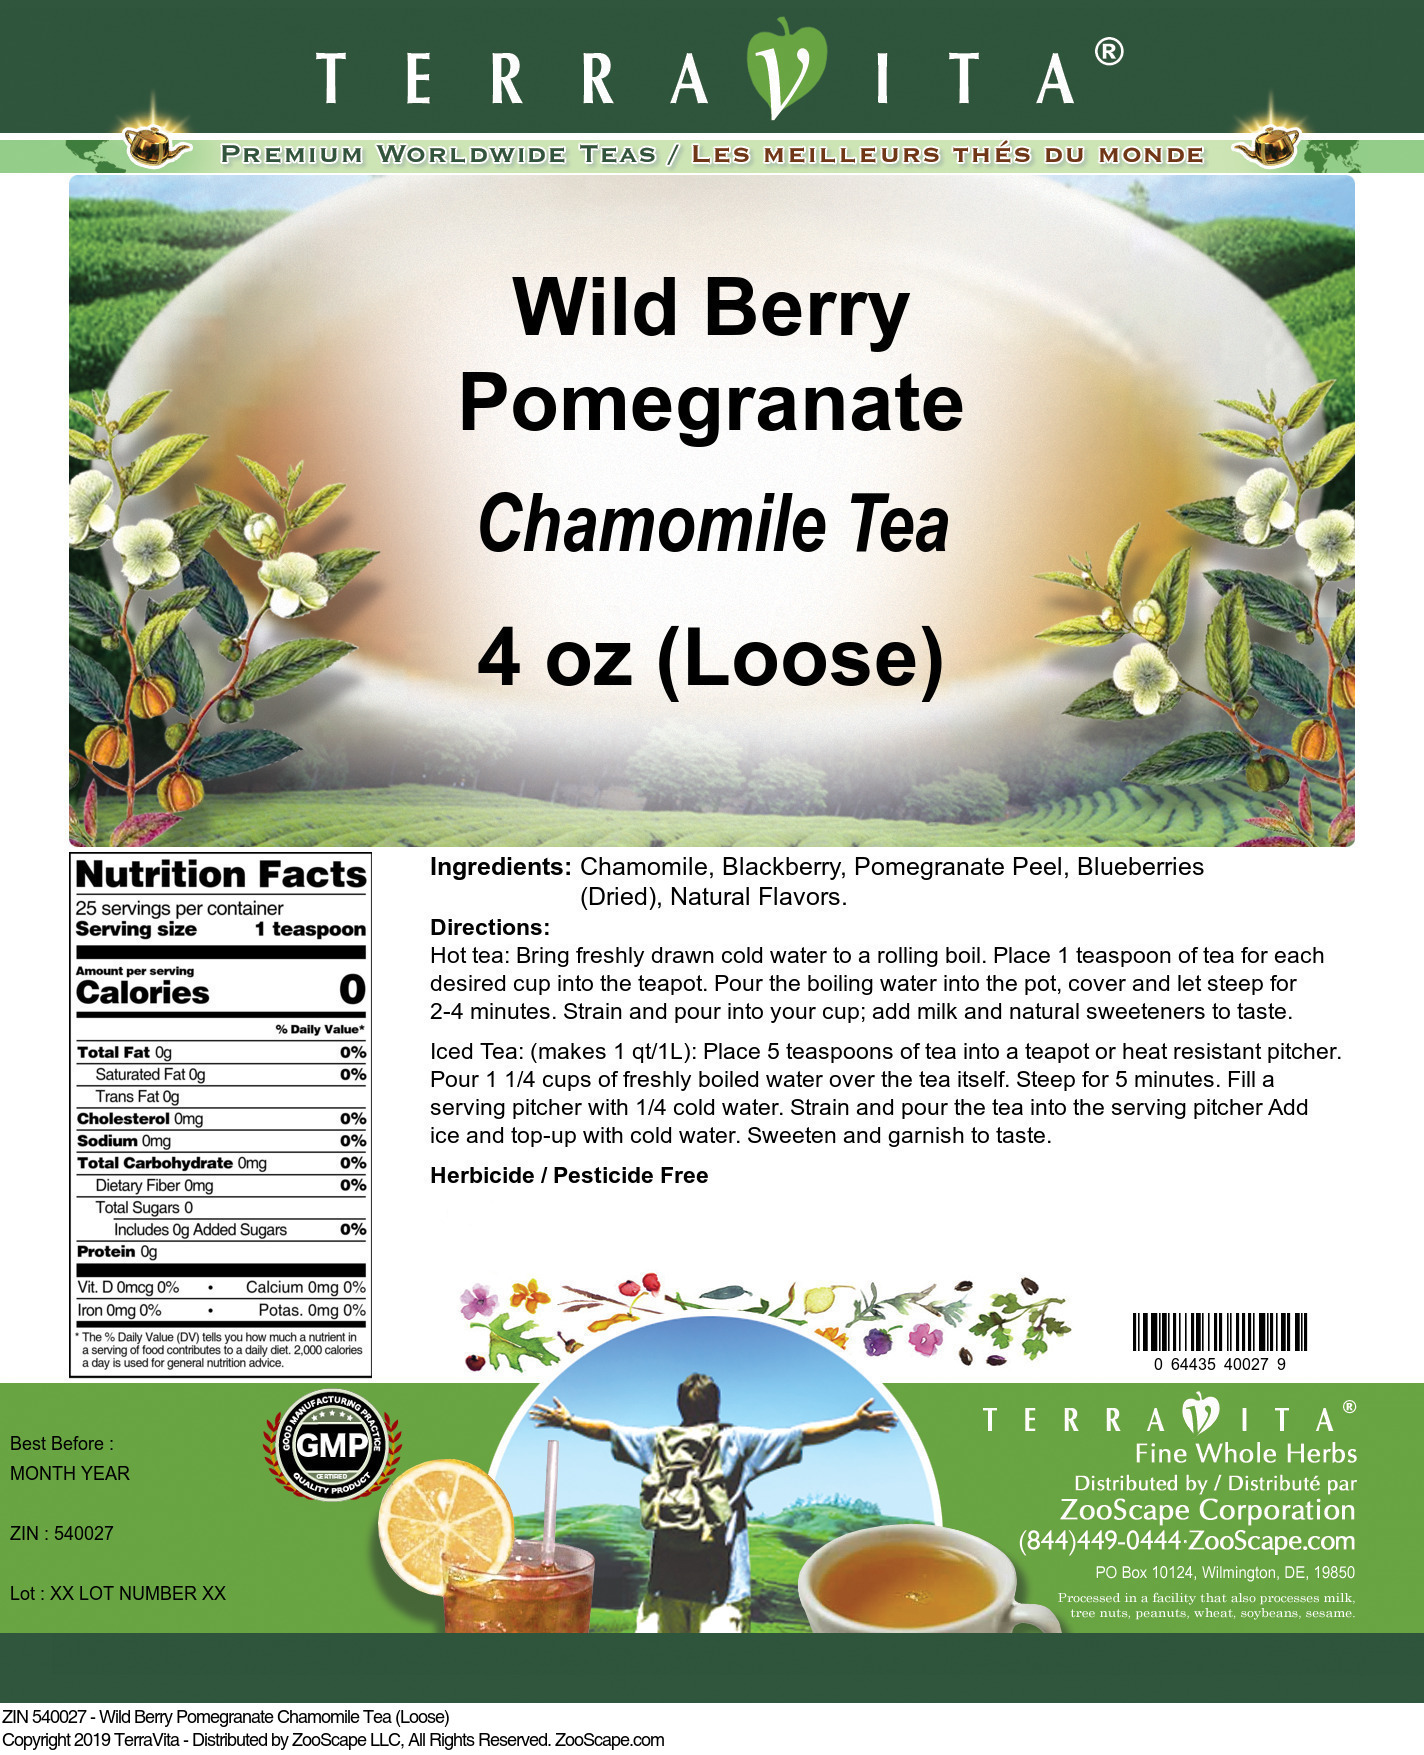 Wild Berry Pomegranate Chamomile Tea